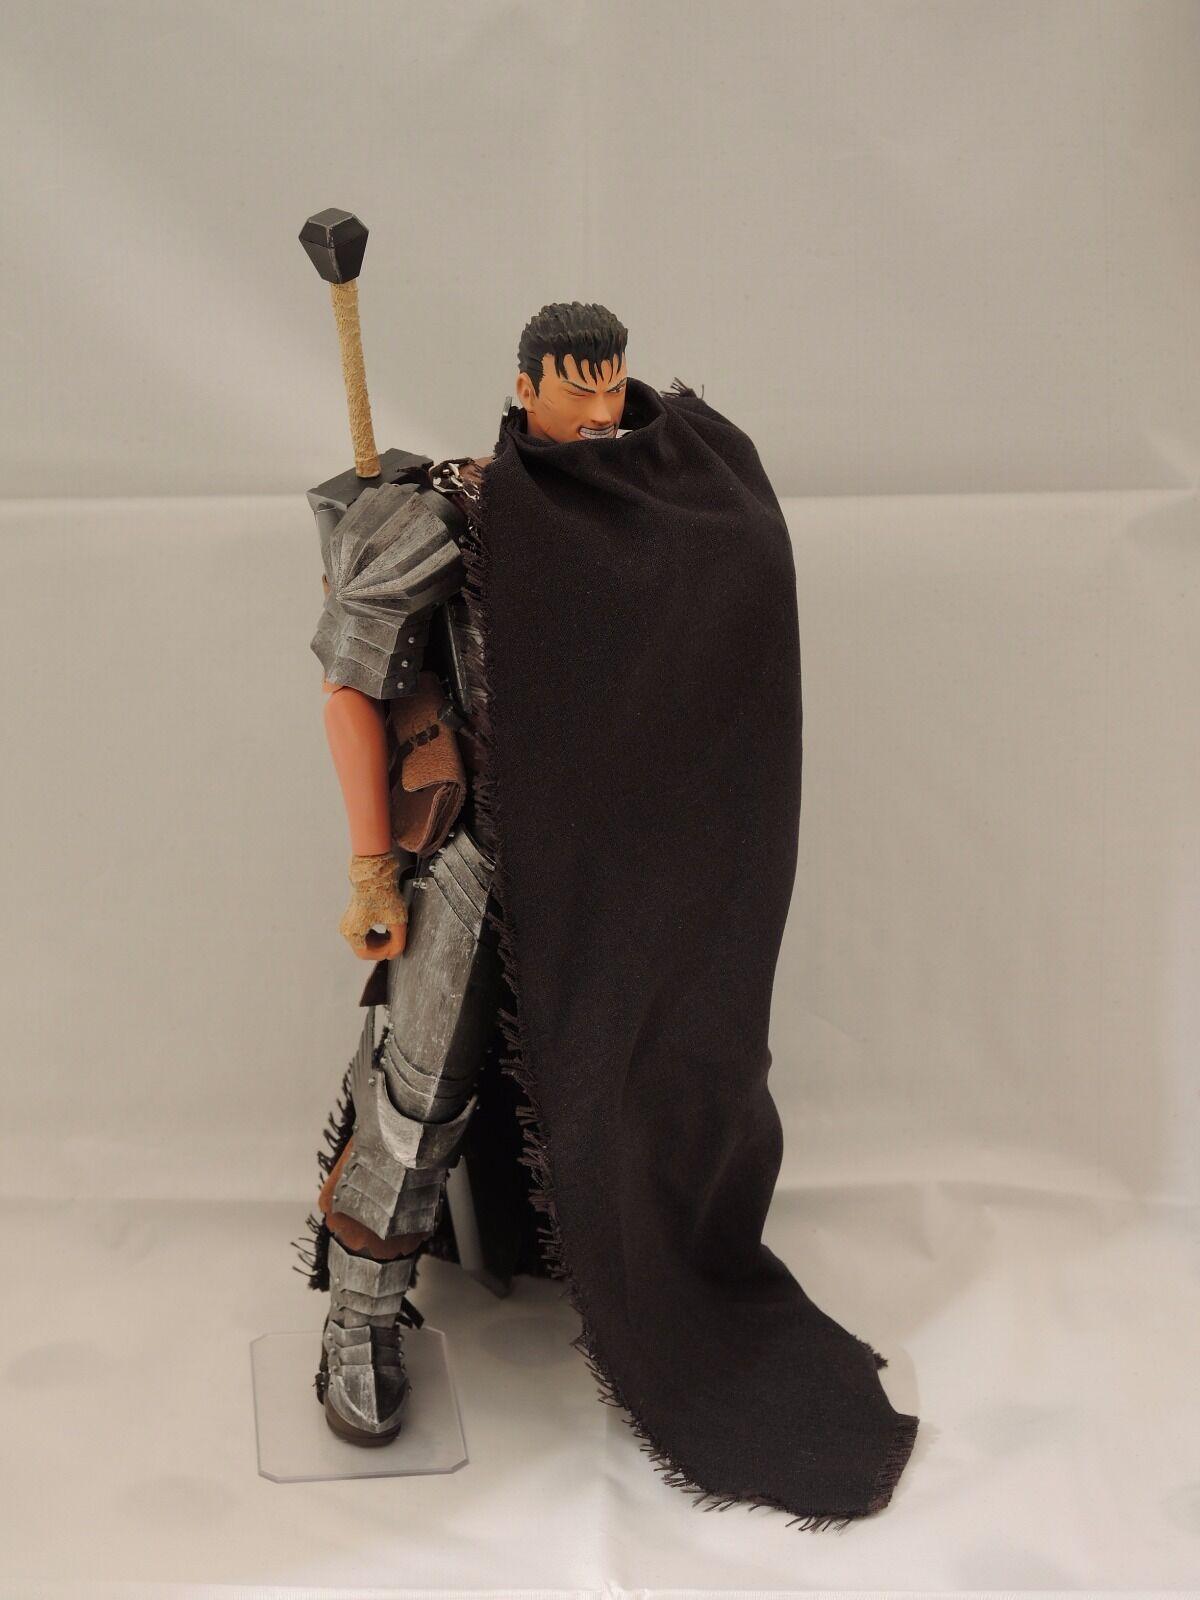 Berserk Guts Berserk Black Swords, Dublin Man Action Figure Art of War